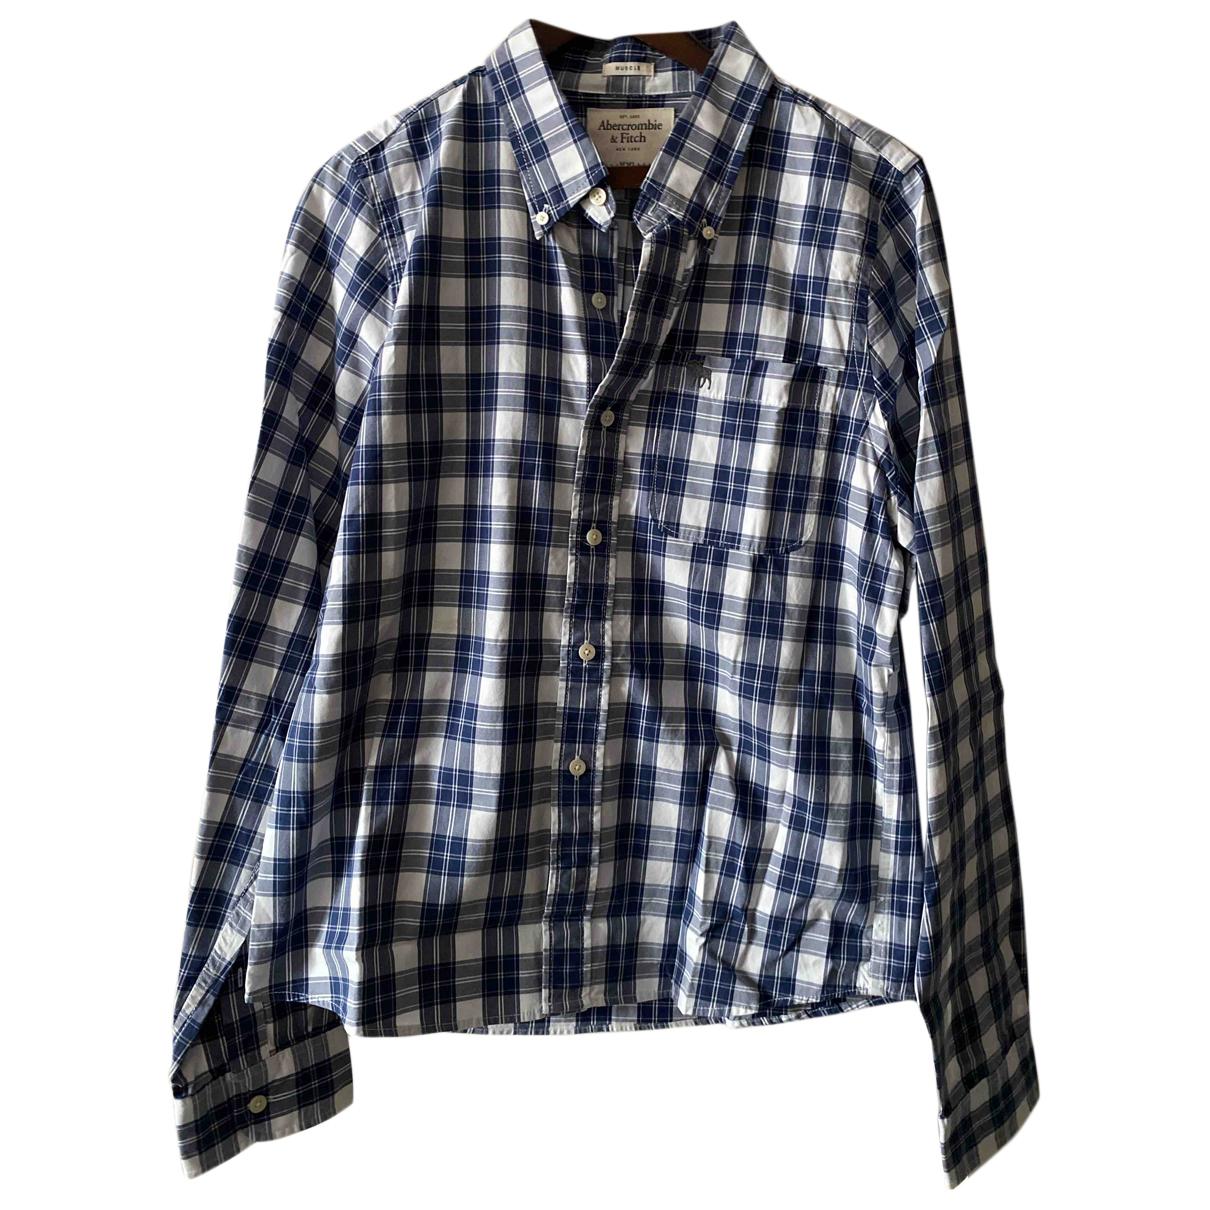 Abercrombie & Fitch N Blue Cotton Shirts for Men XXL International